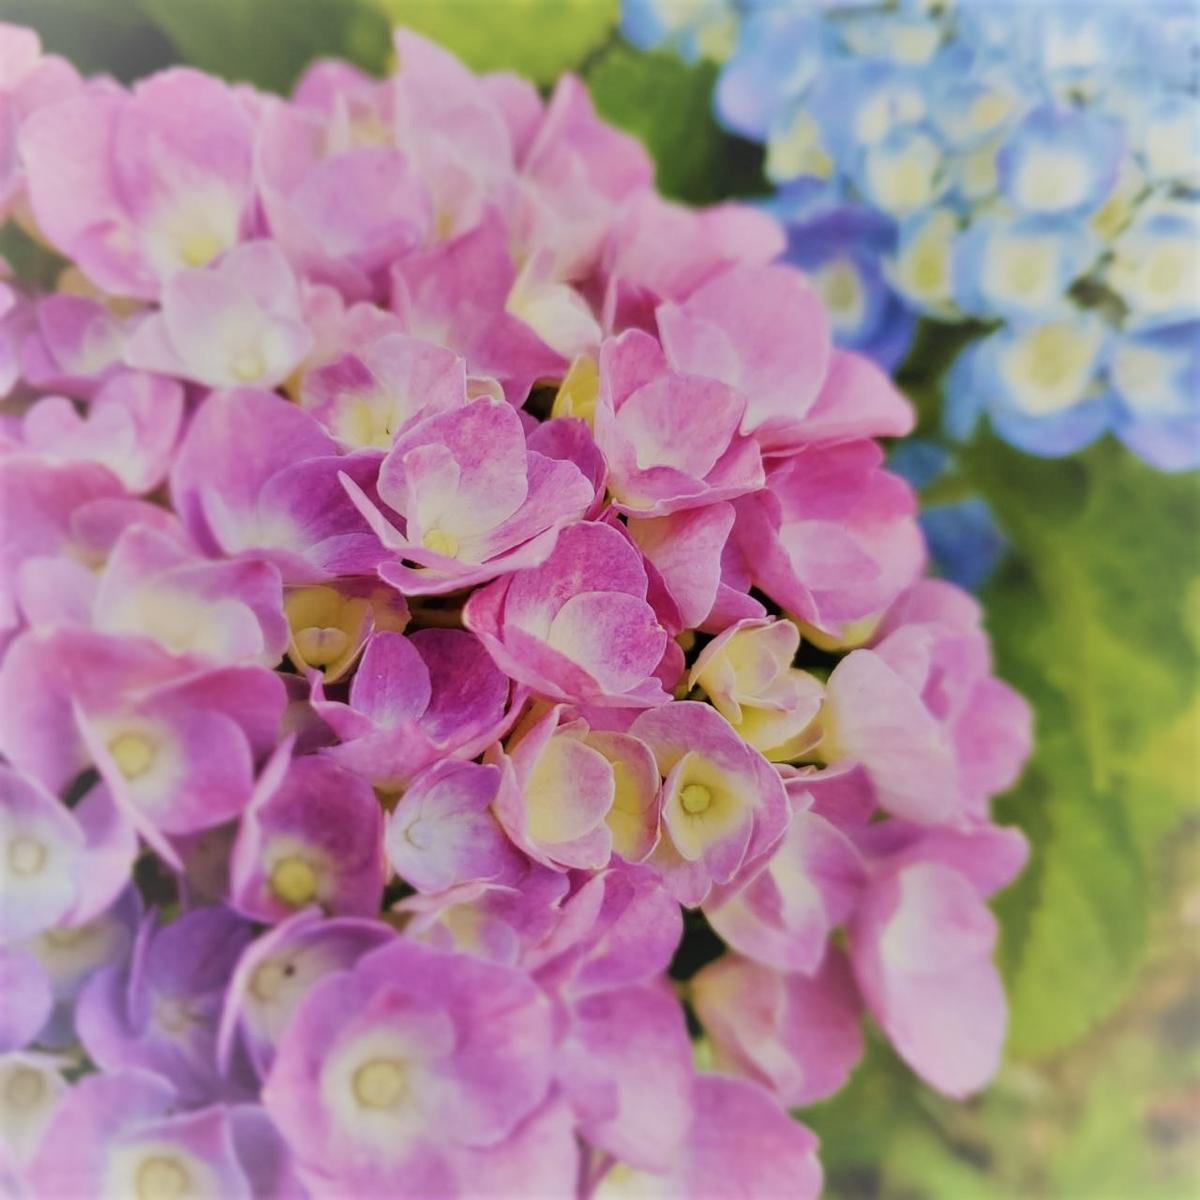 f:id:floraisony:20200601212539j:plain